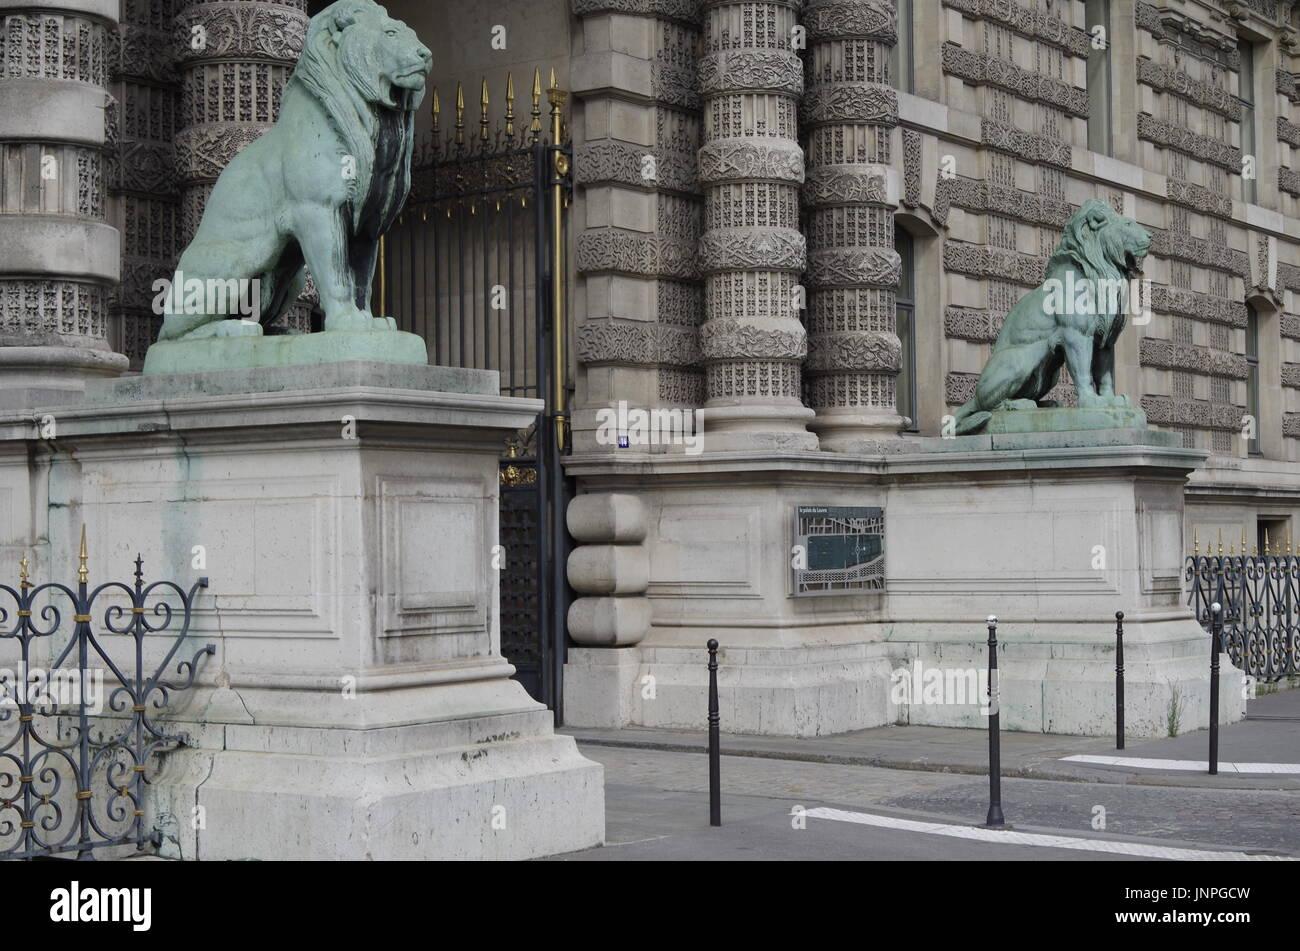 The Lion Gate, Porte des Lions, at the Louvre, Paris, one of the world's great museums, on Quai des Tuilleries, Stock Photo